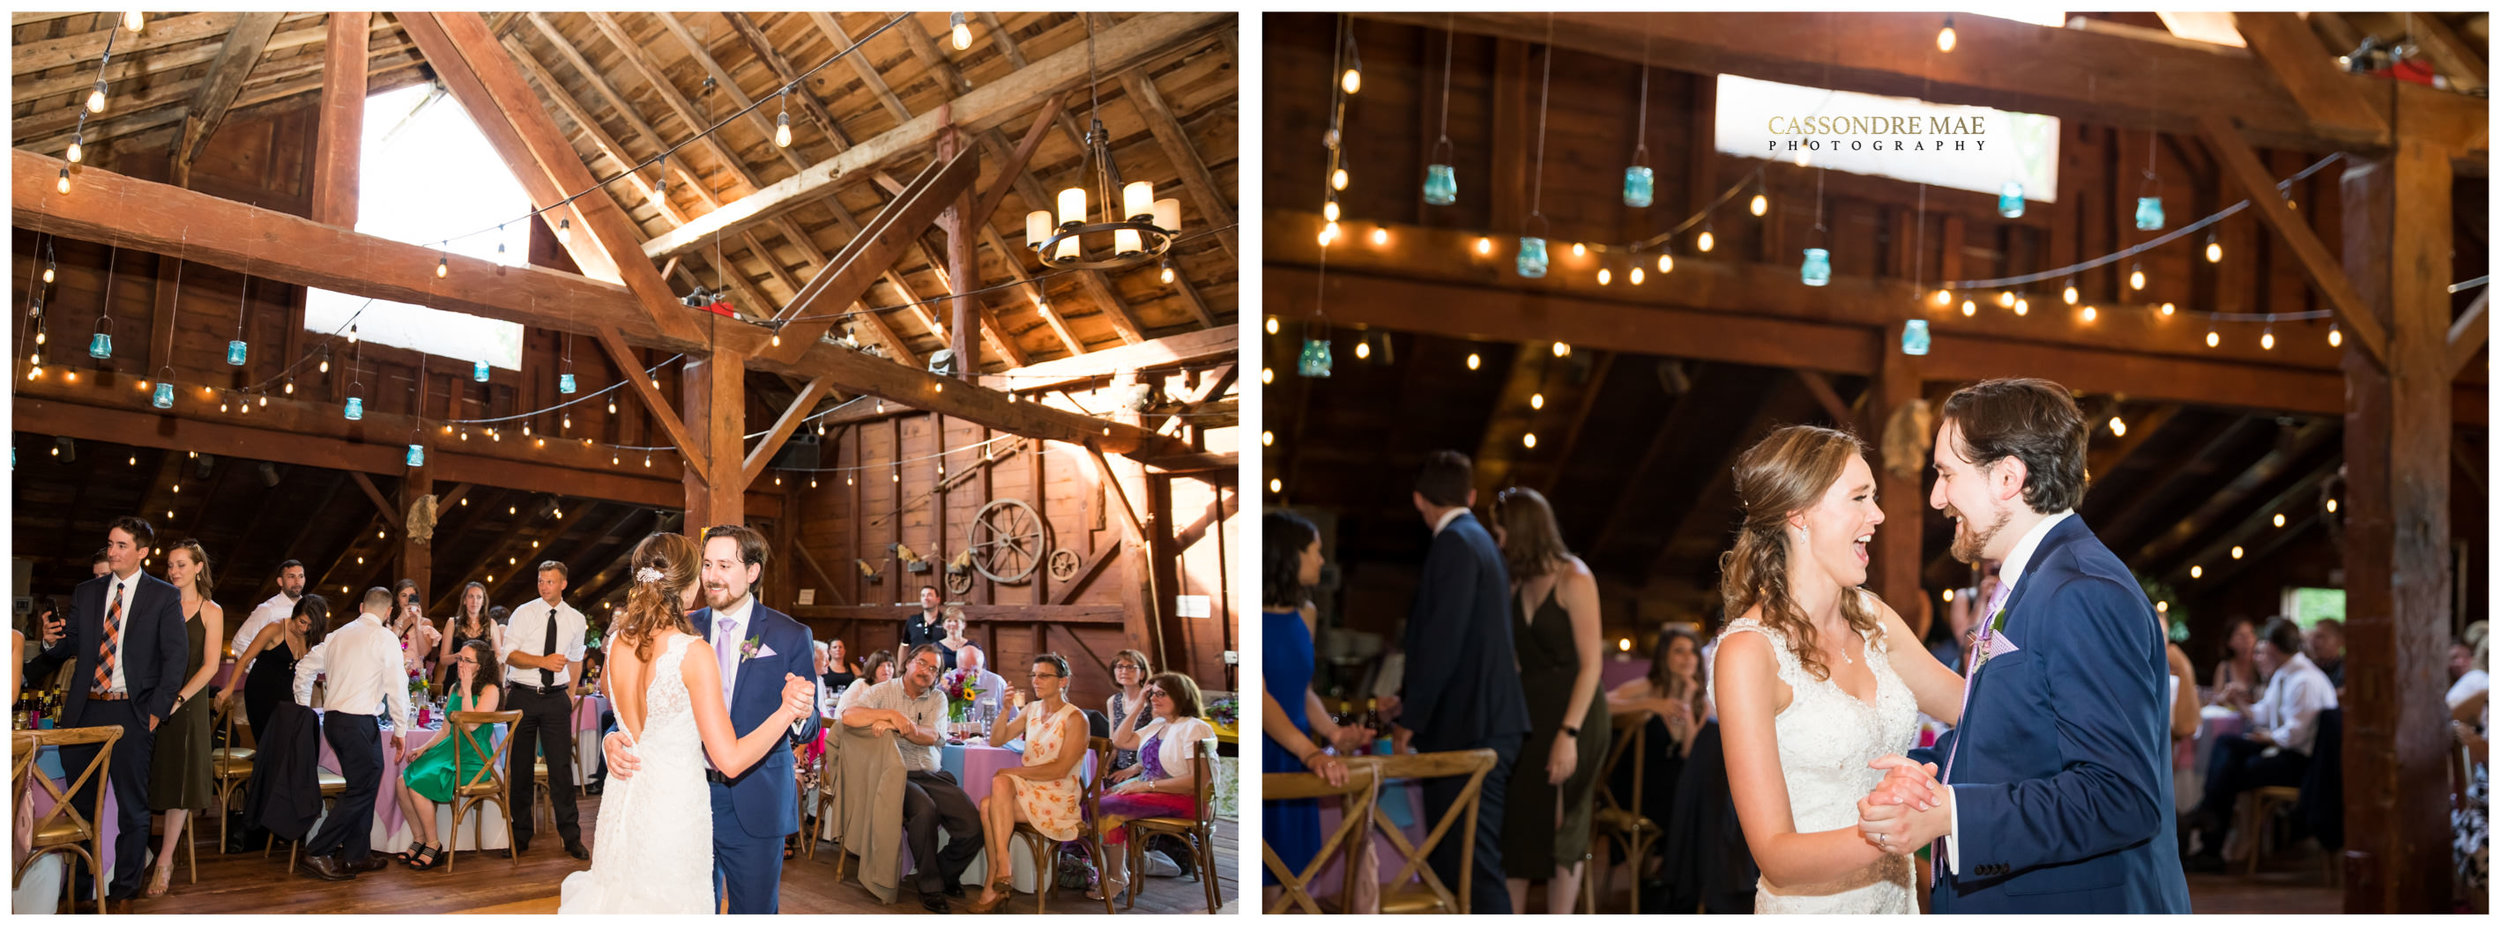 Cassondre Mae Photography hudson valley barn weddings -16.jpg